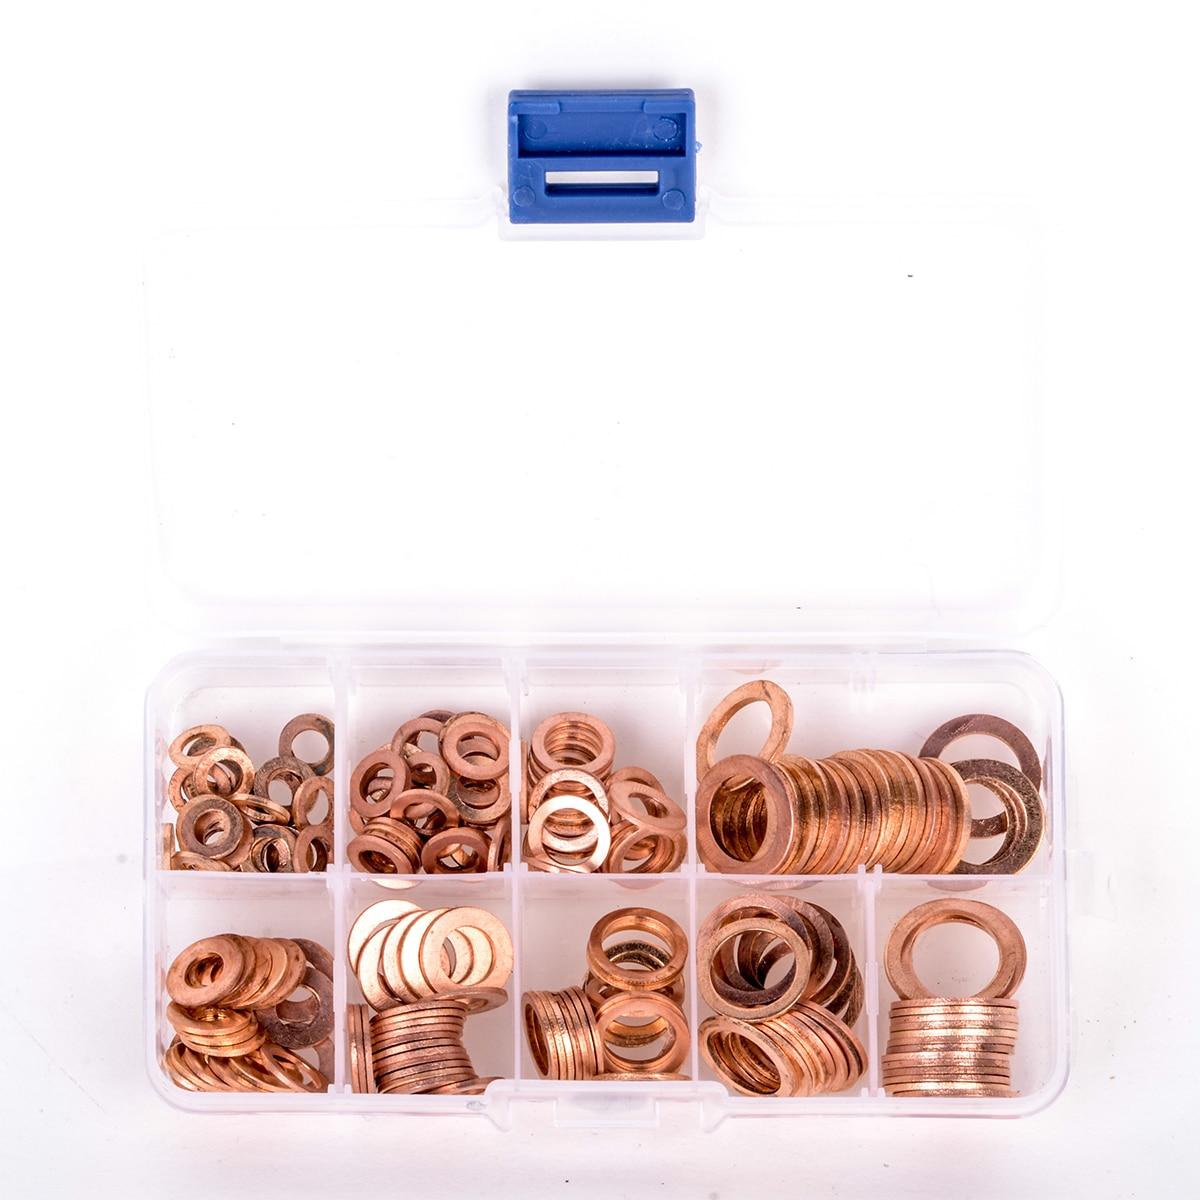 200 unids M5-M14 profesional de arandela de cobre Junta conjunto de sello de anillo surtido Kit con caja para accesorios de Hardware